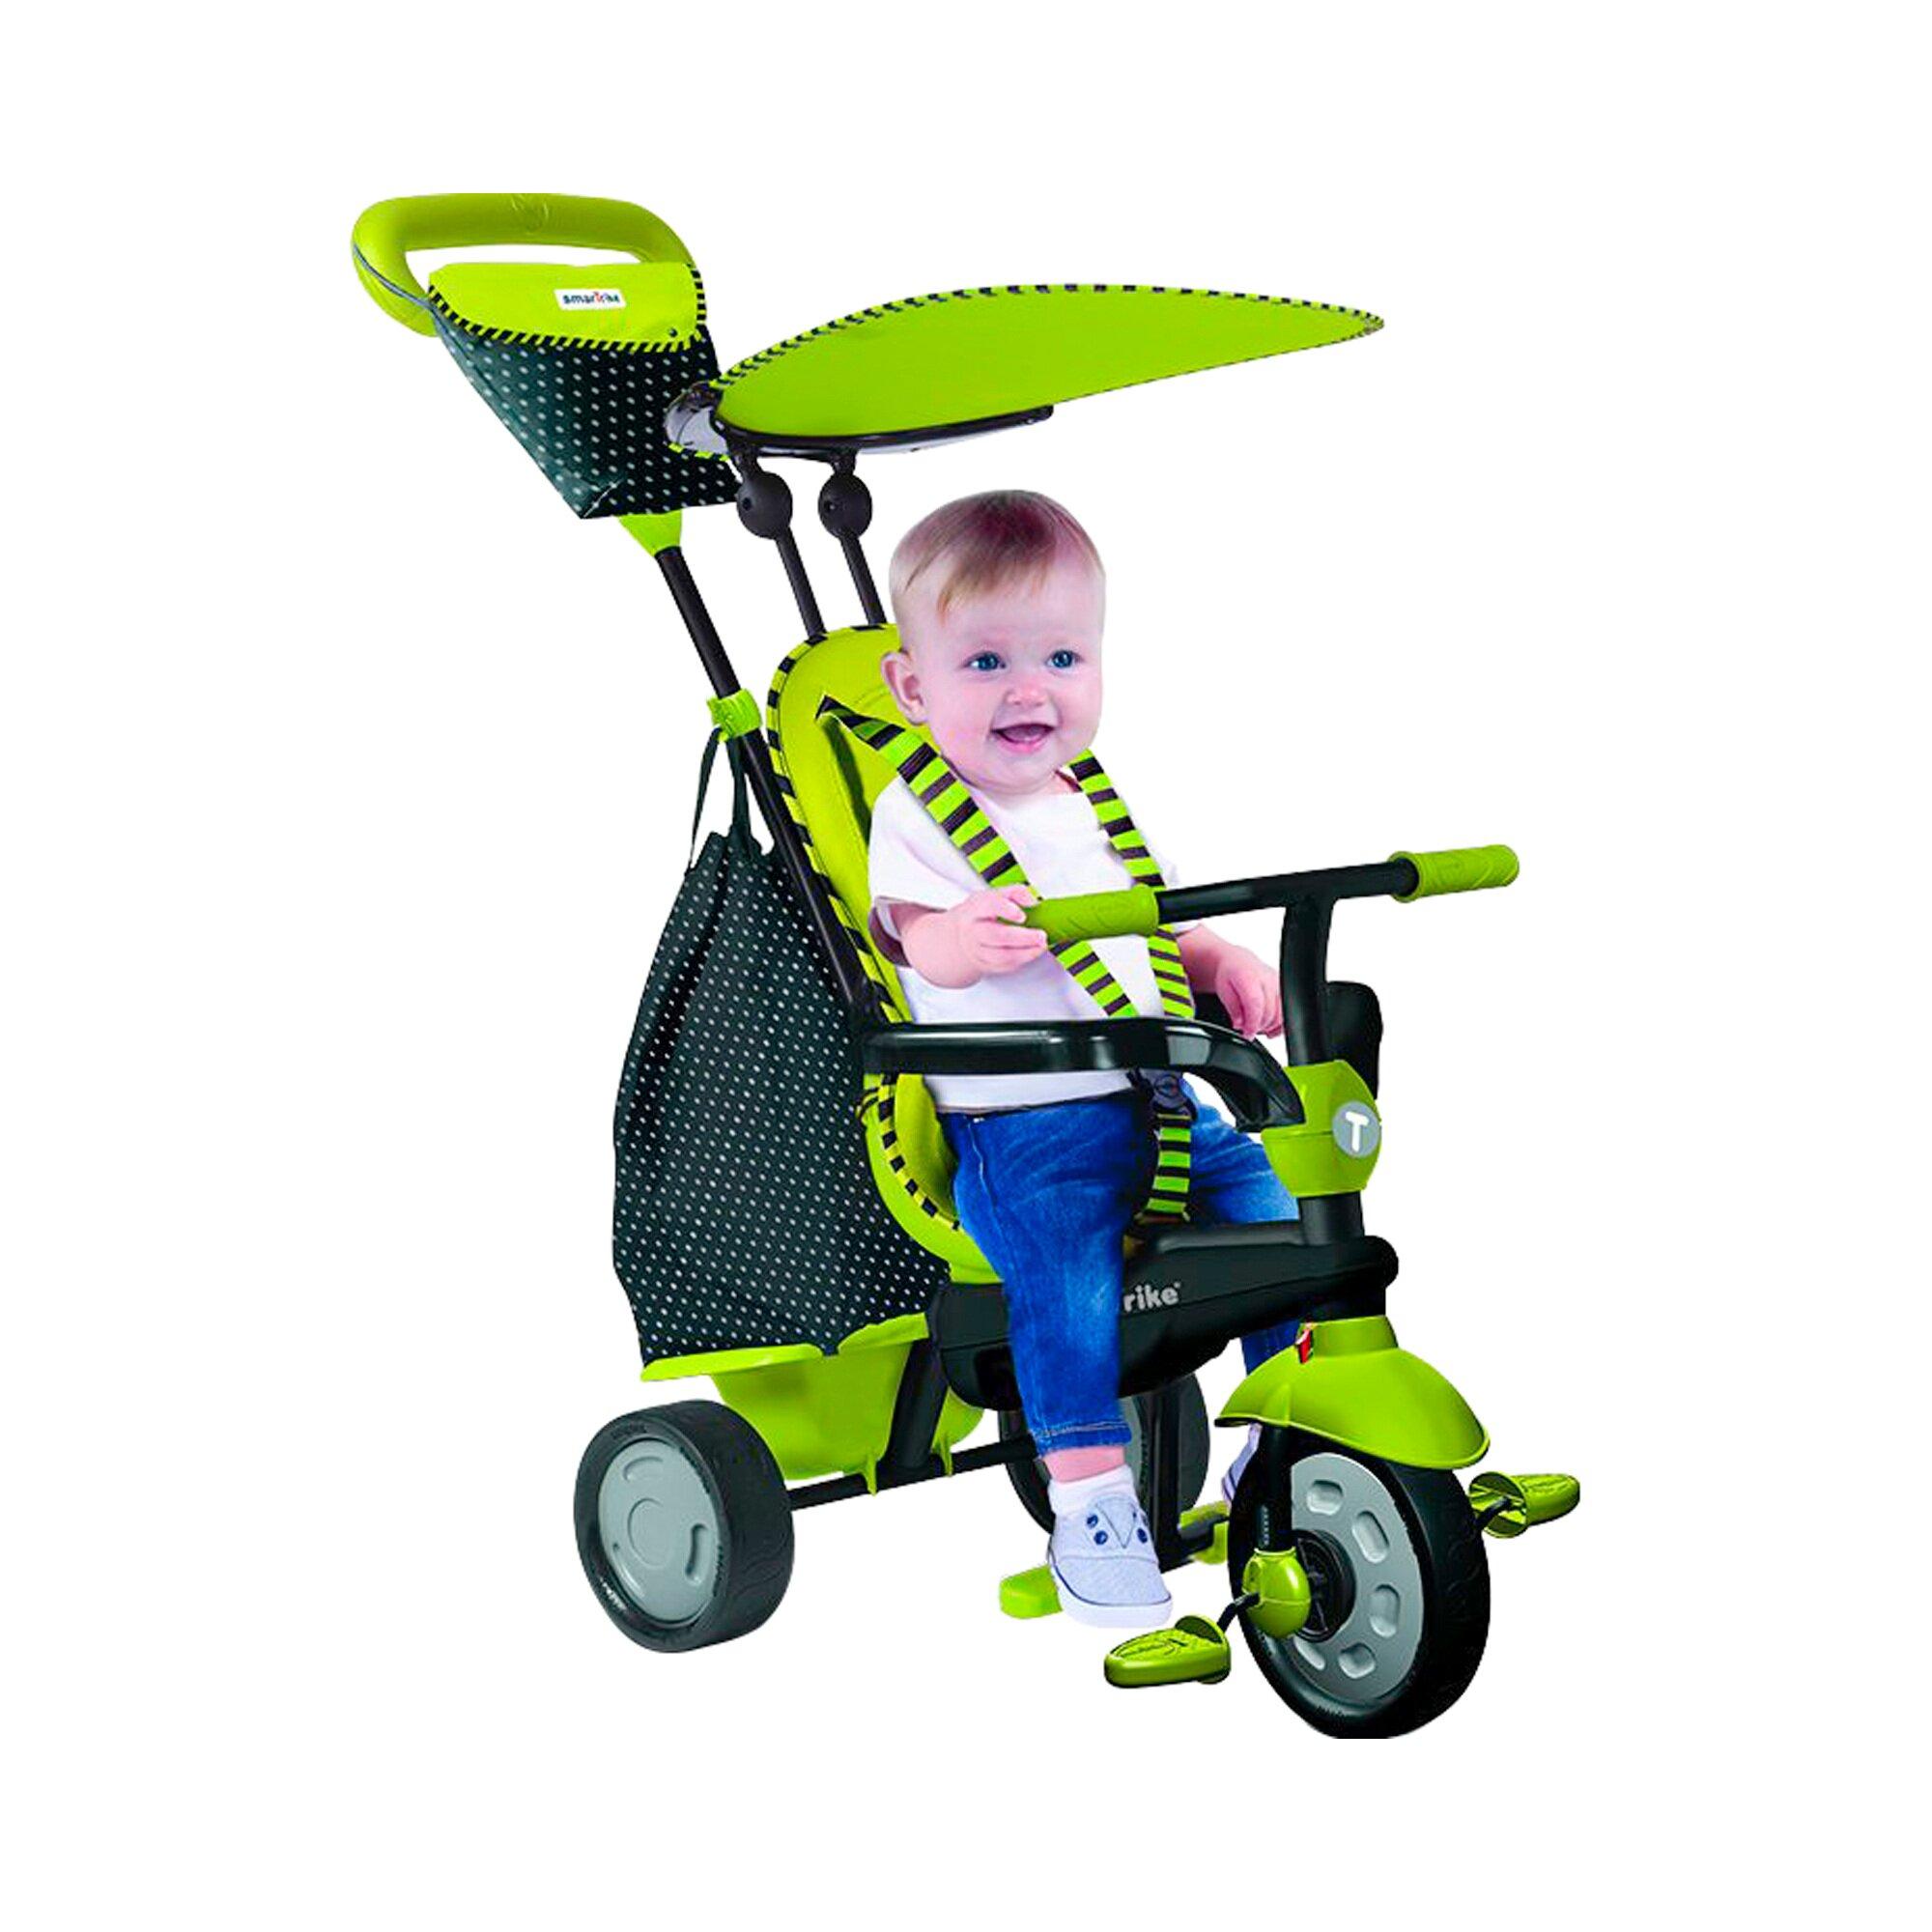 smartrike-dreirad-glow-4-in-1-baby-trike